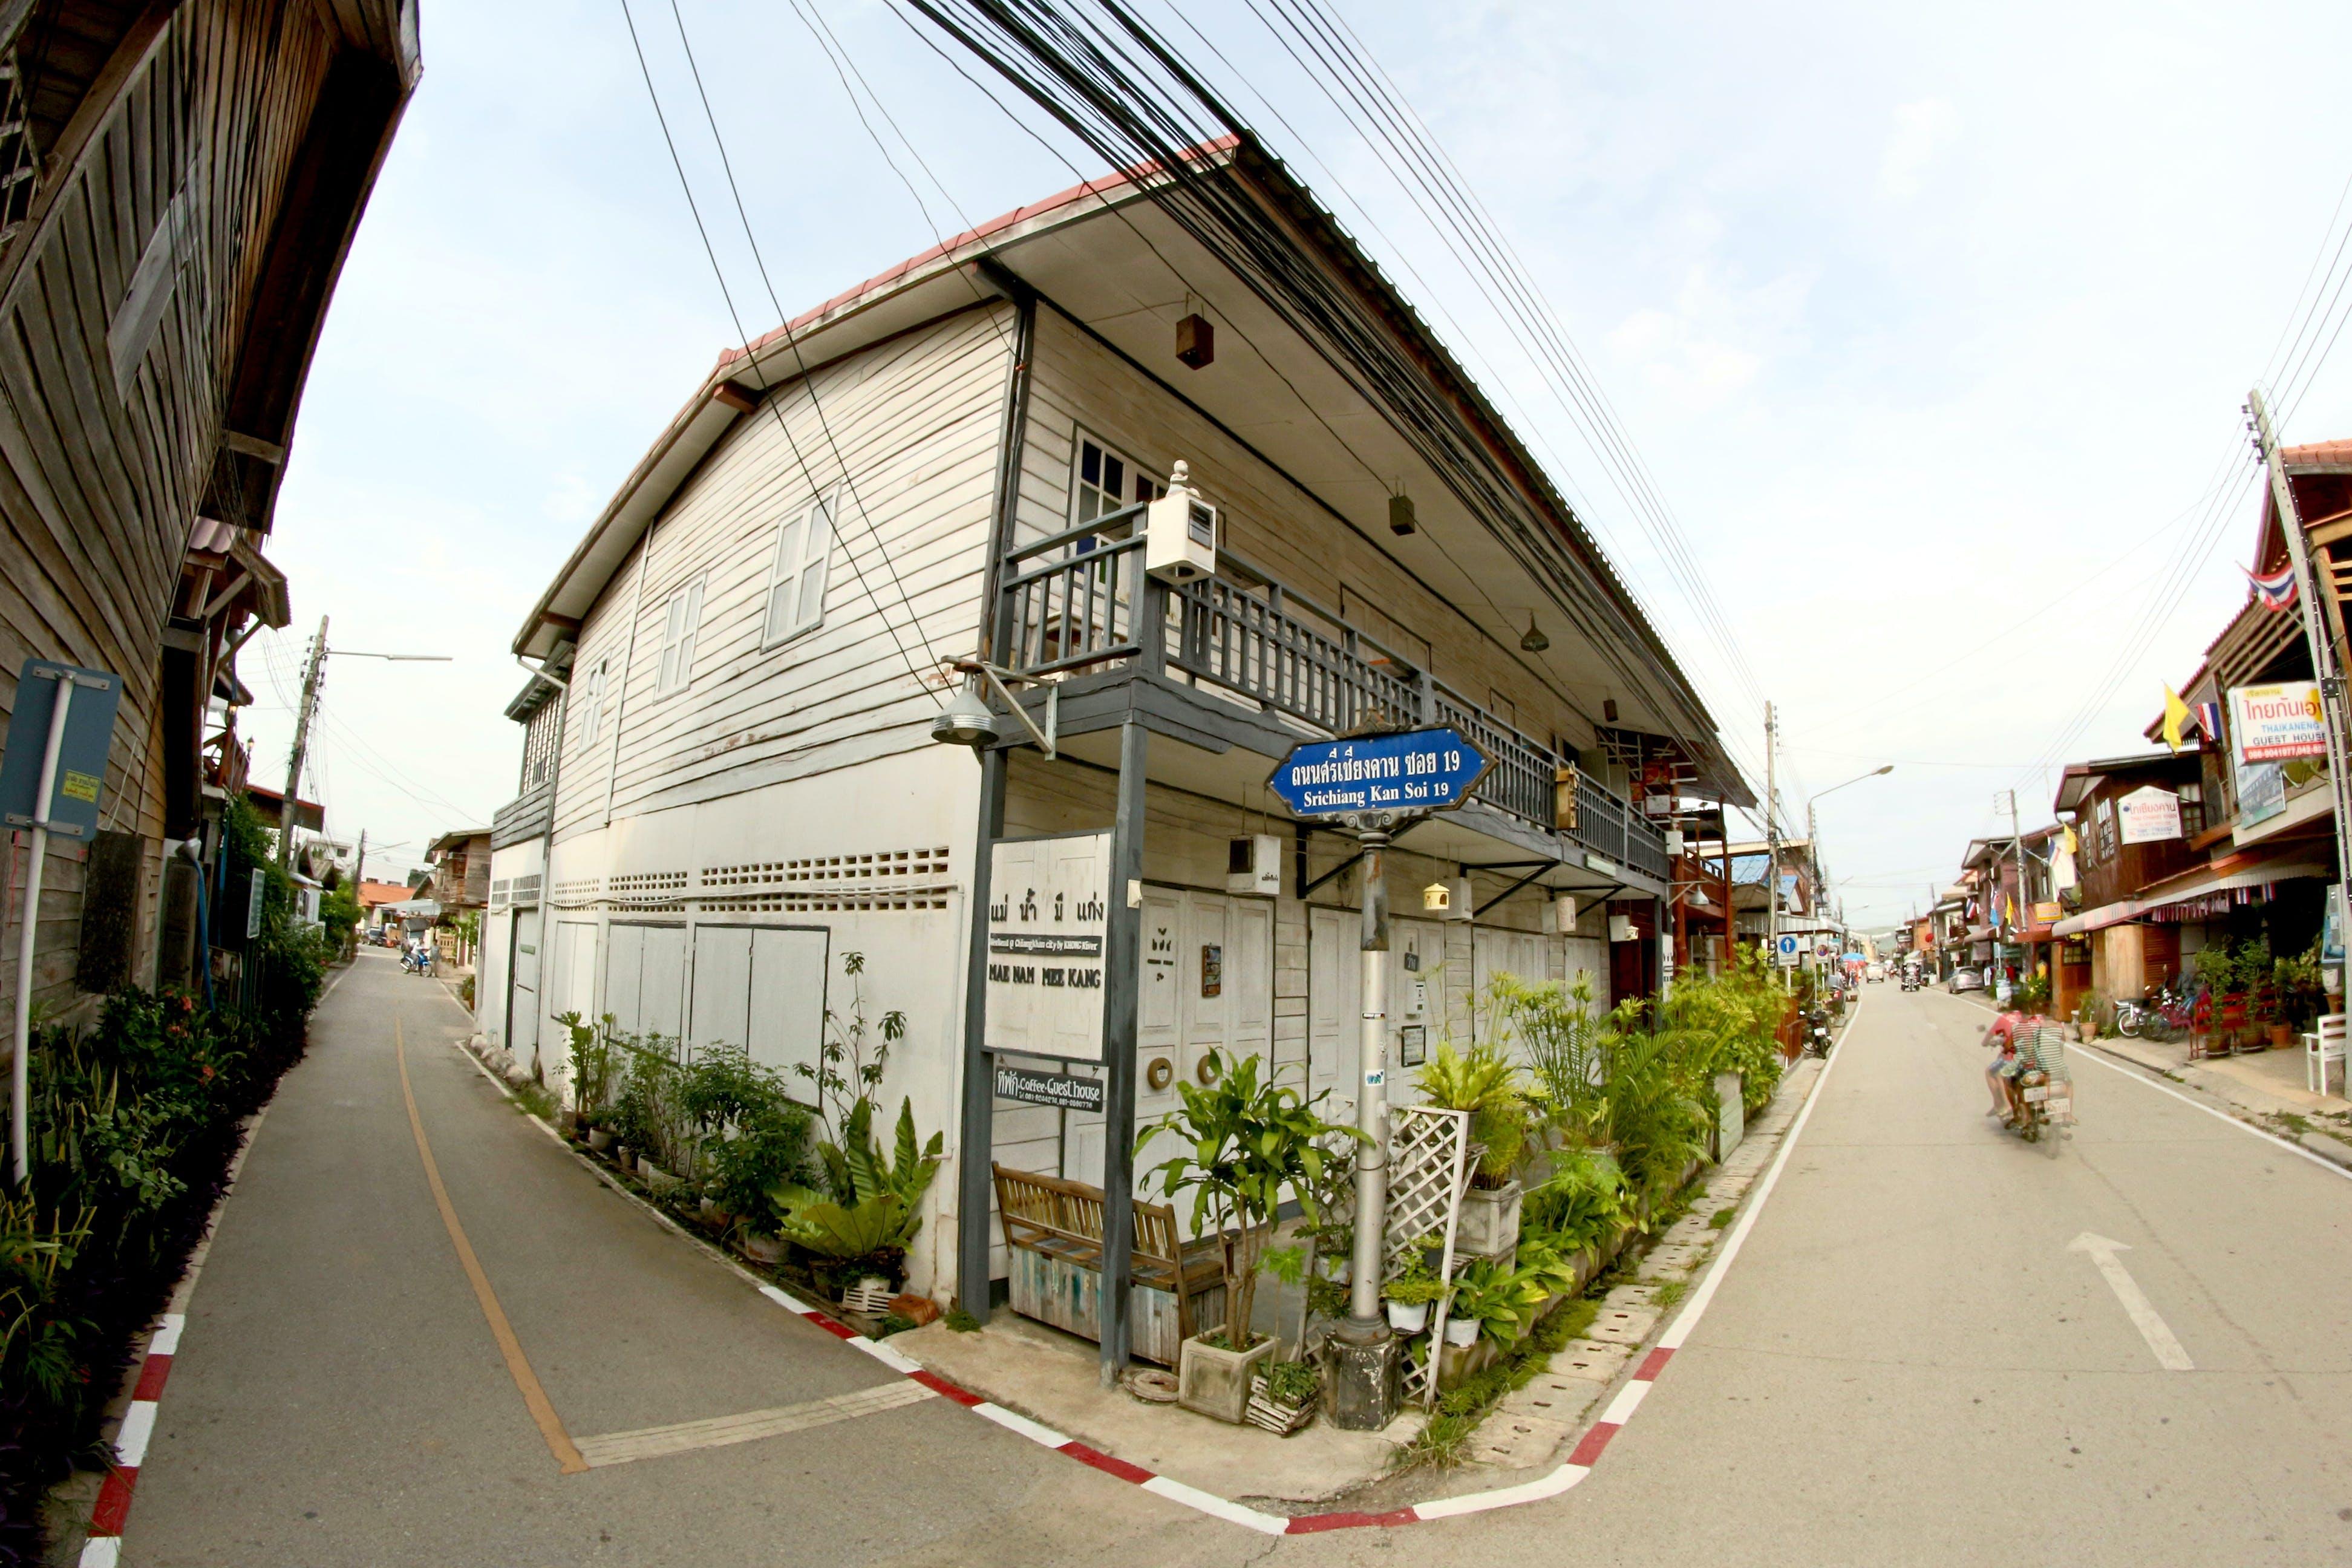 asphalt, buildings, downtown